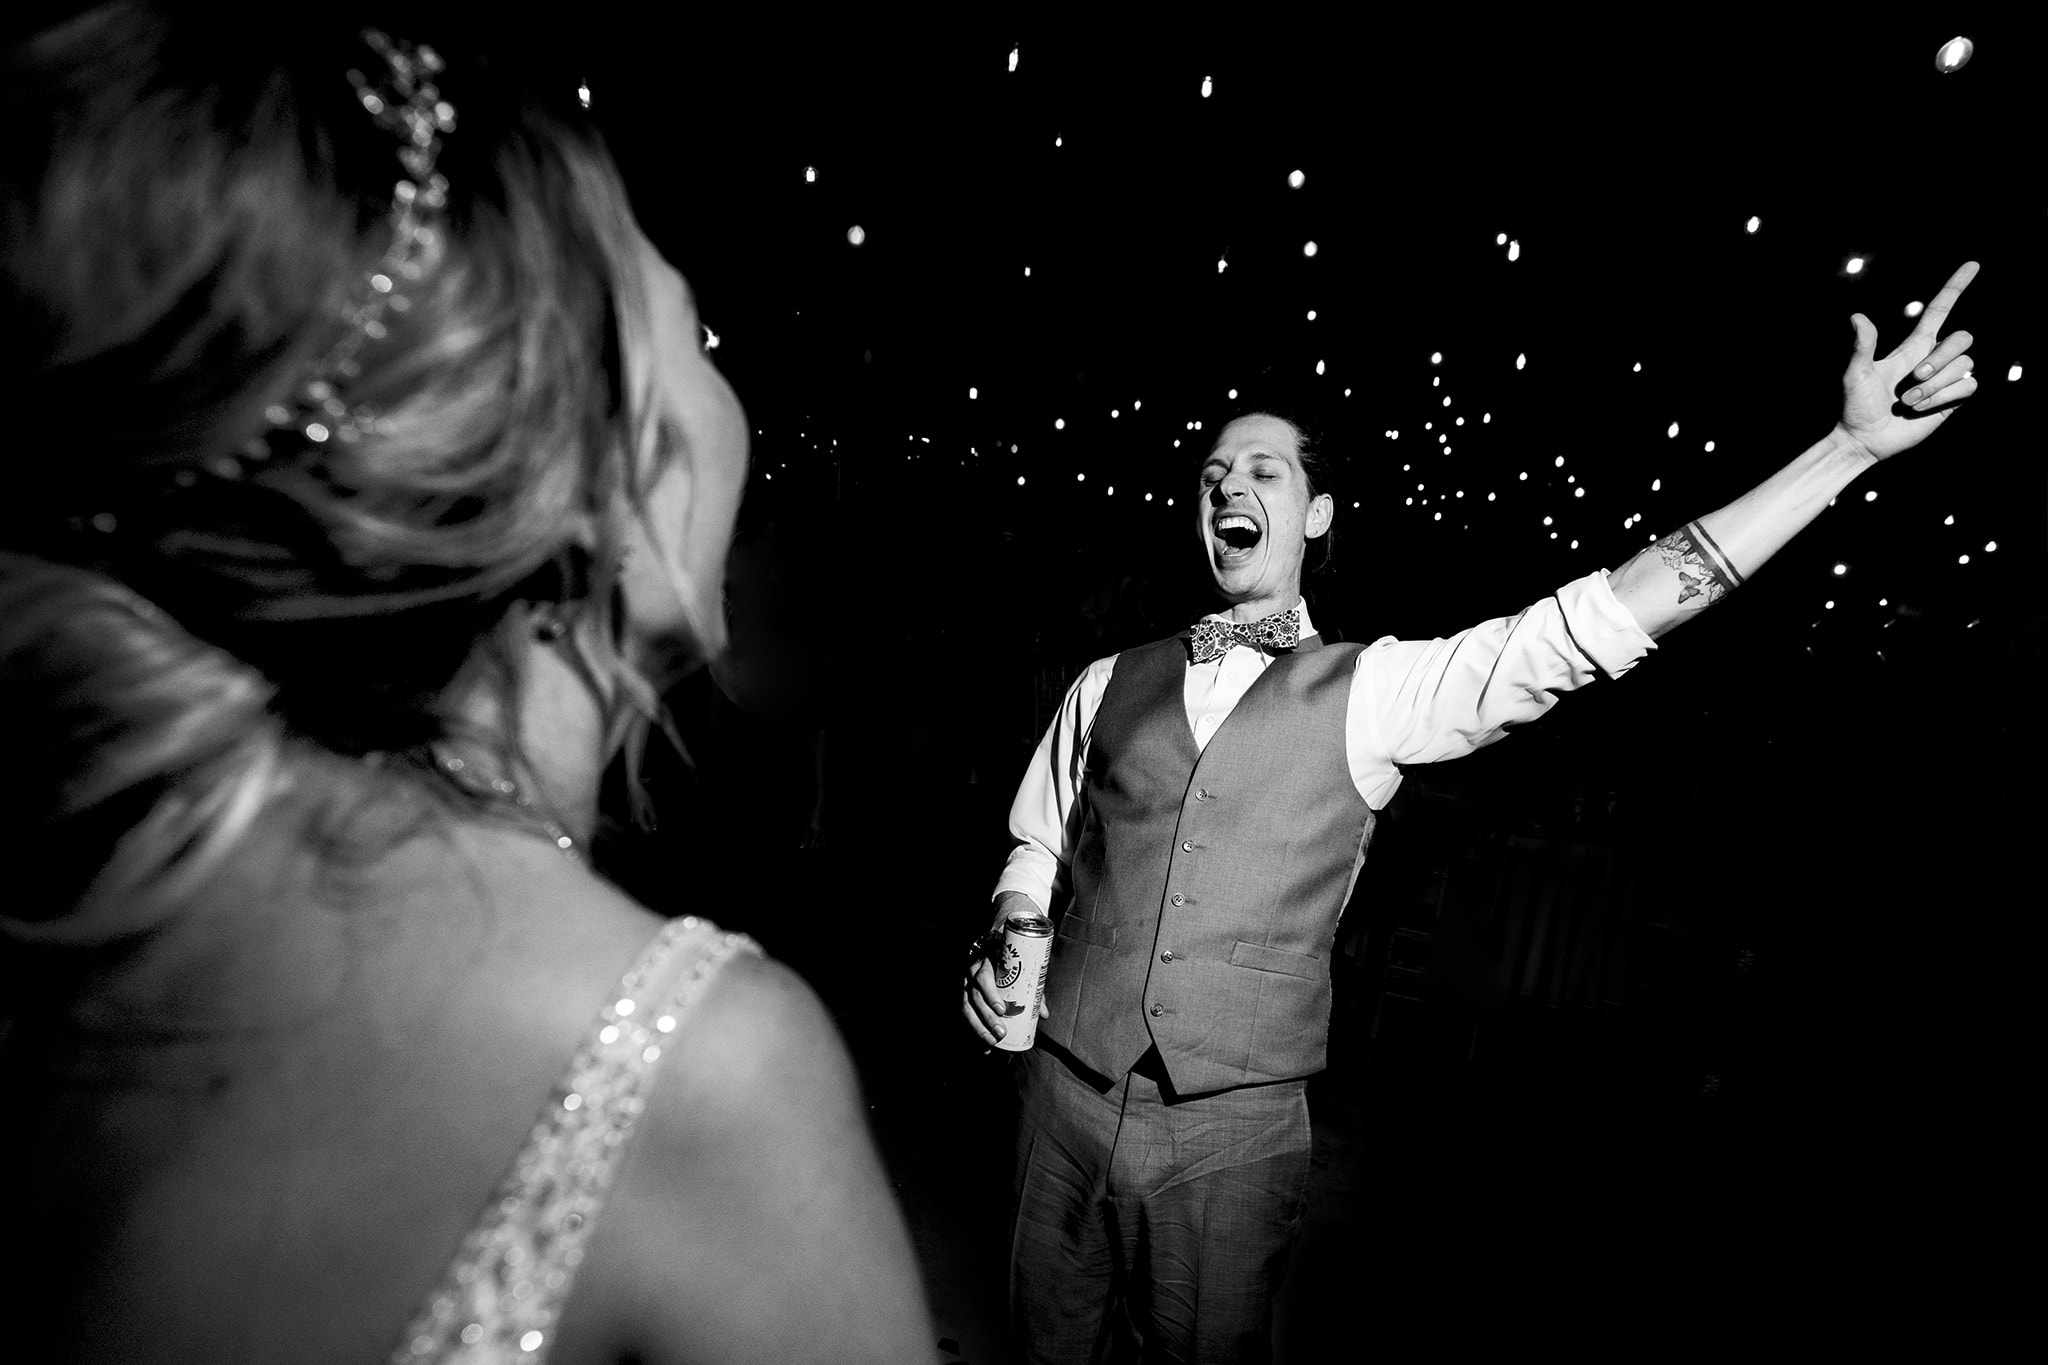 Groom singing and dancing at wedding reception